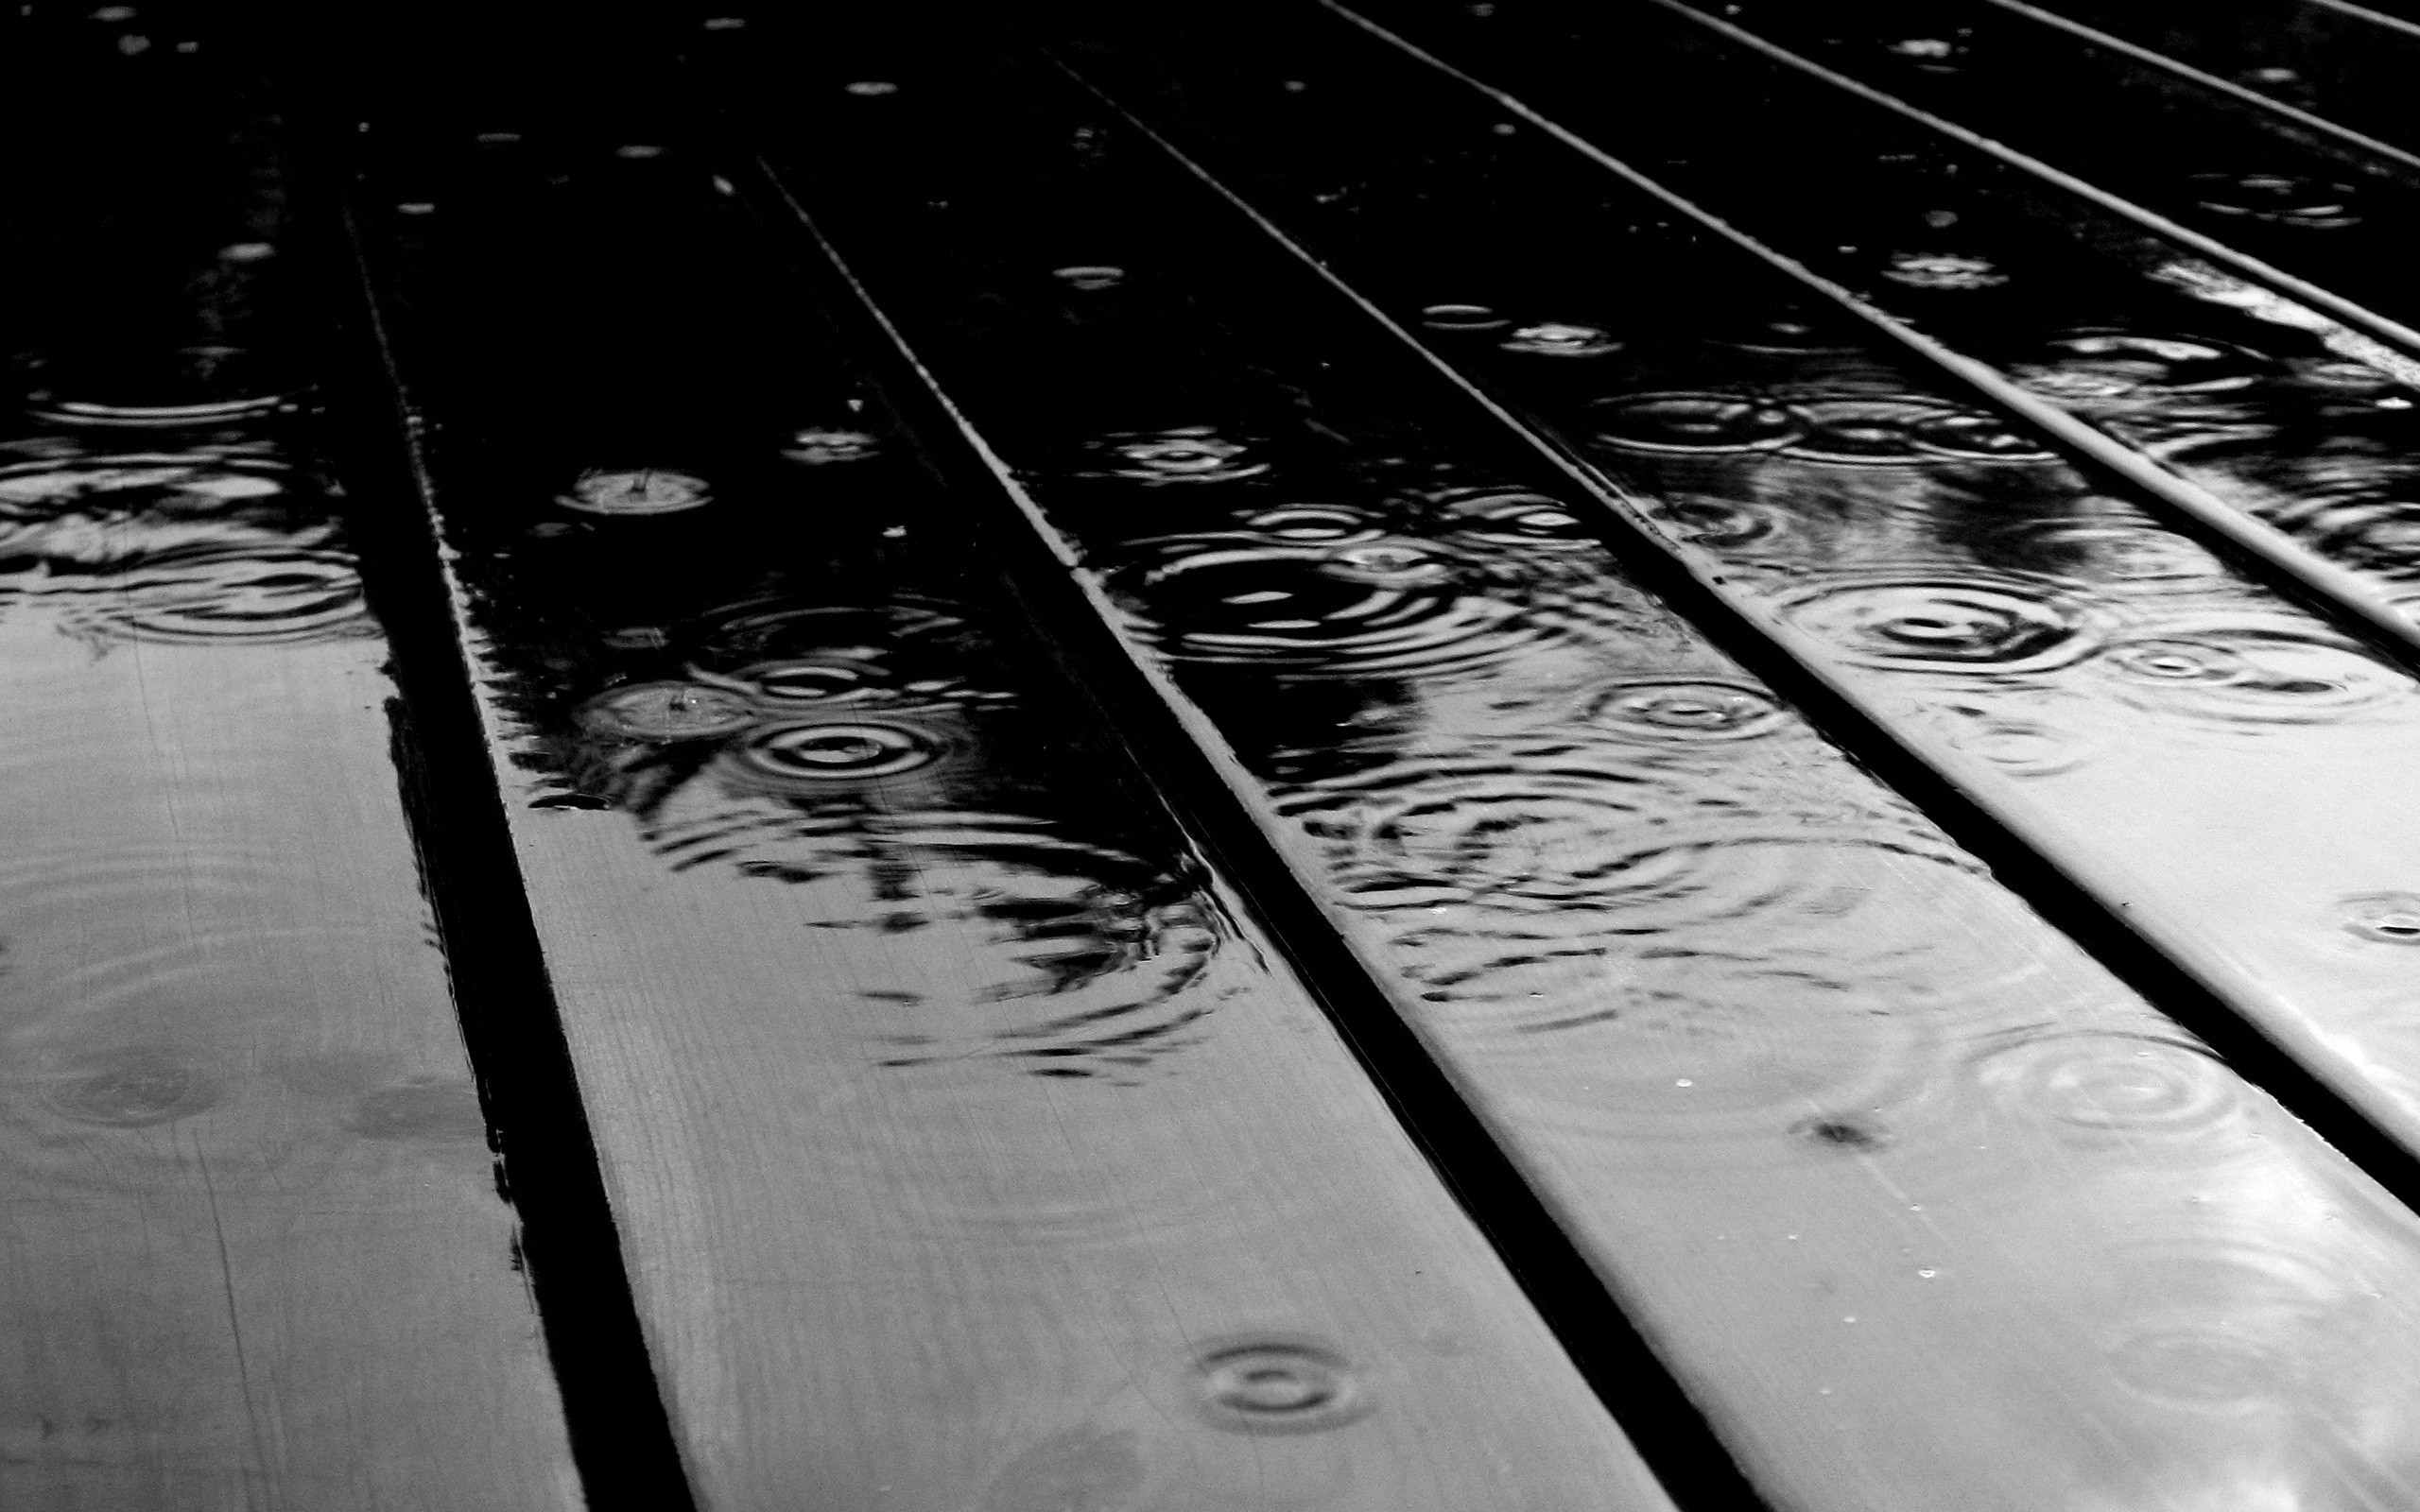 Rain Drops Black And White Wallpaper